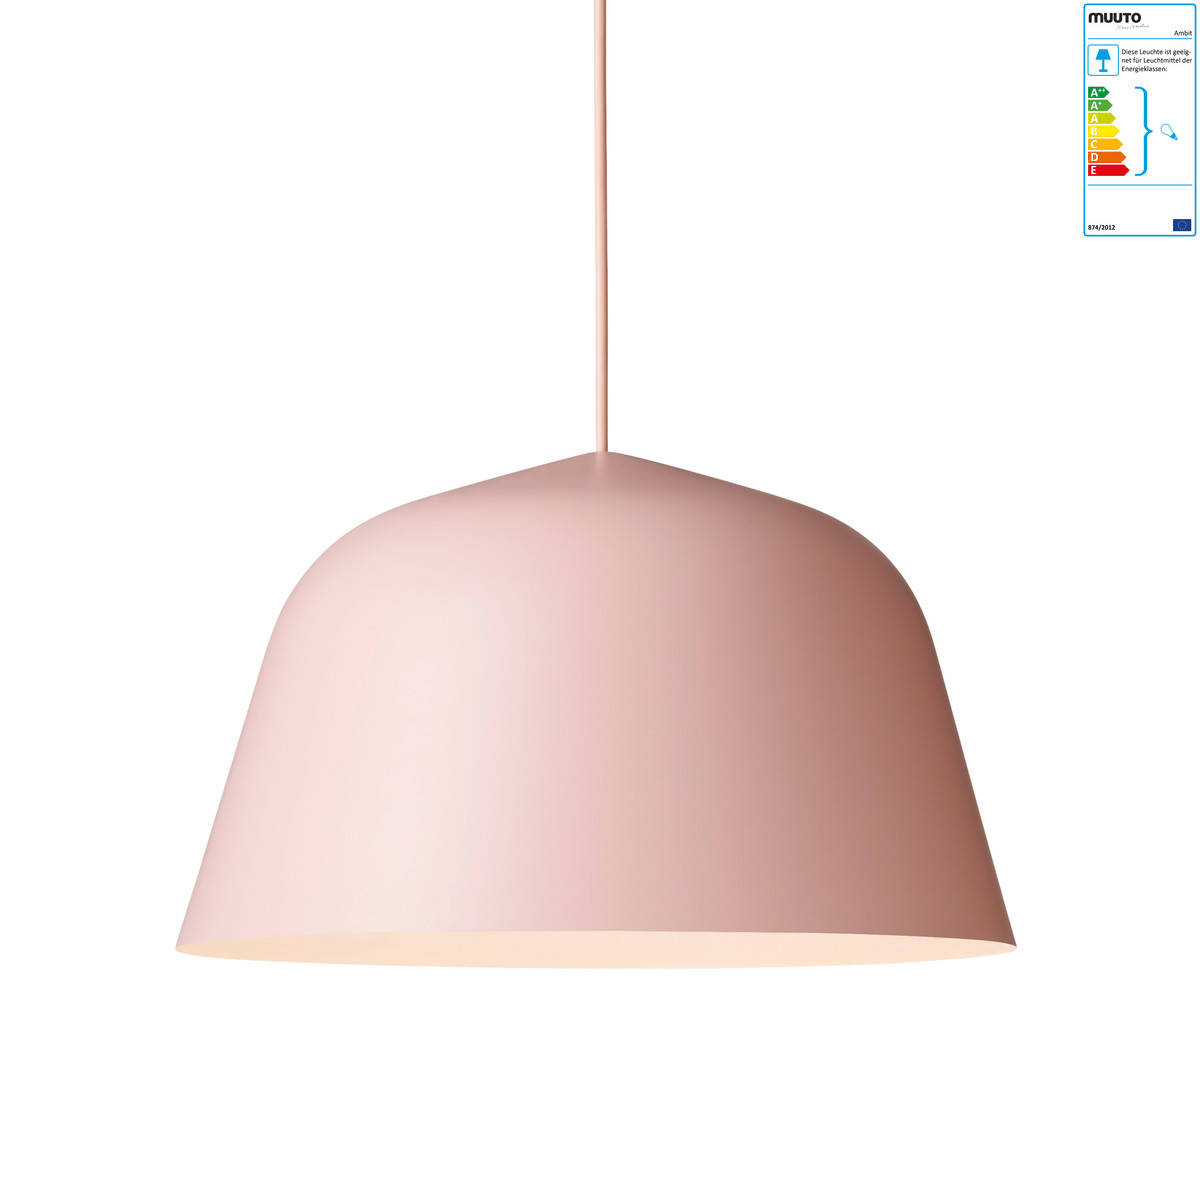 muuto ambit pendelleuchte 40 cm rosa rosa h 23 online kaufen bei woonio. Black Bedroom Furniture Sets. Home Design Ideas